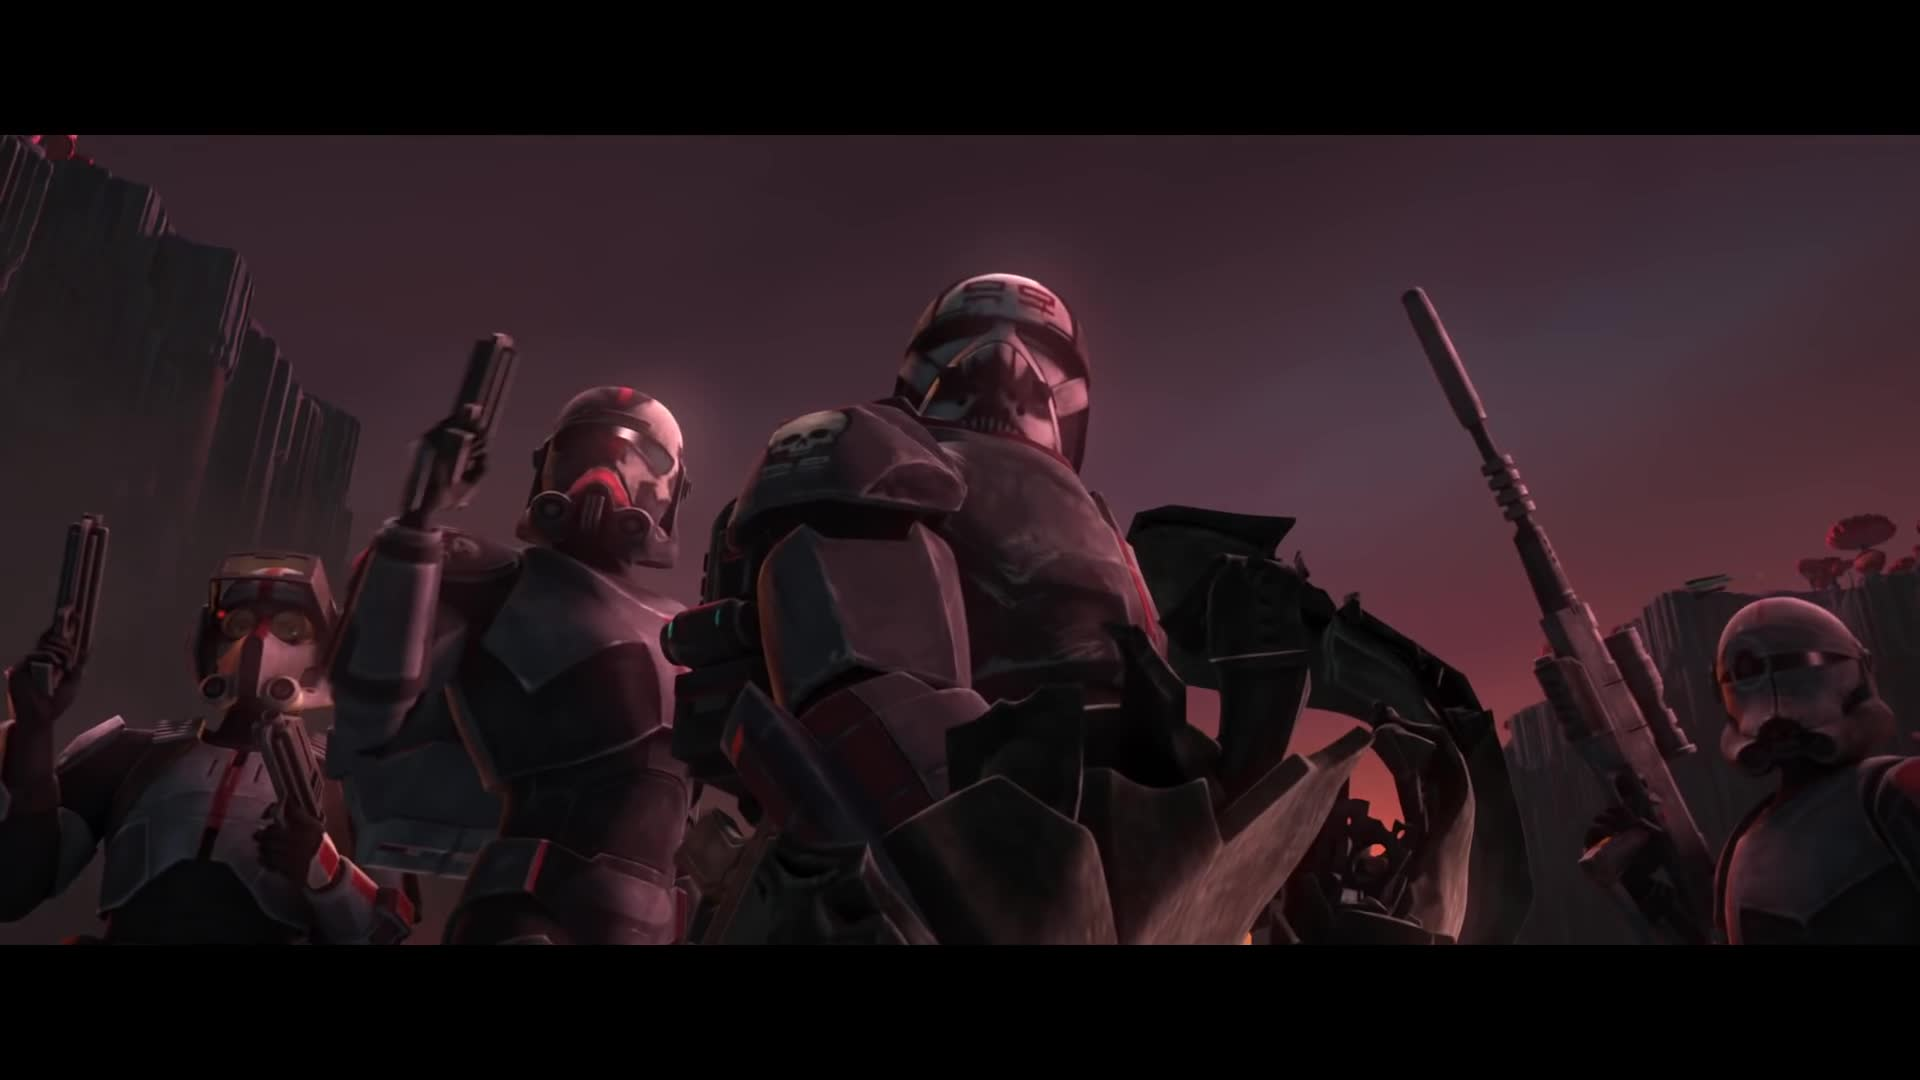 Trailer, Serie, Star Wars, Disney, Disney+, The Clone Wars, Star Wars: The Clone Wars